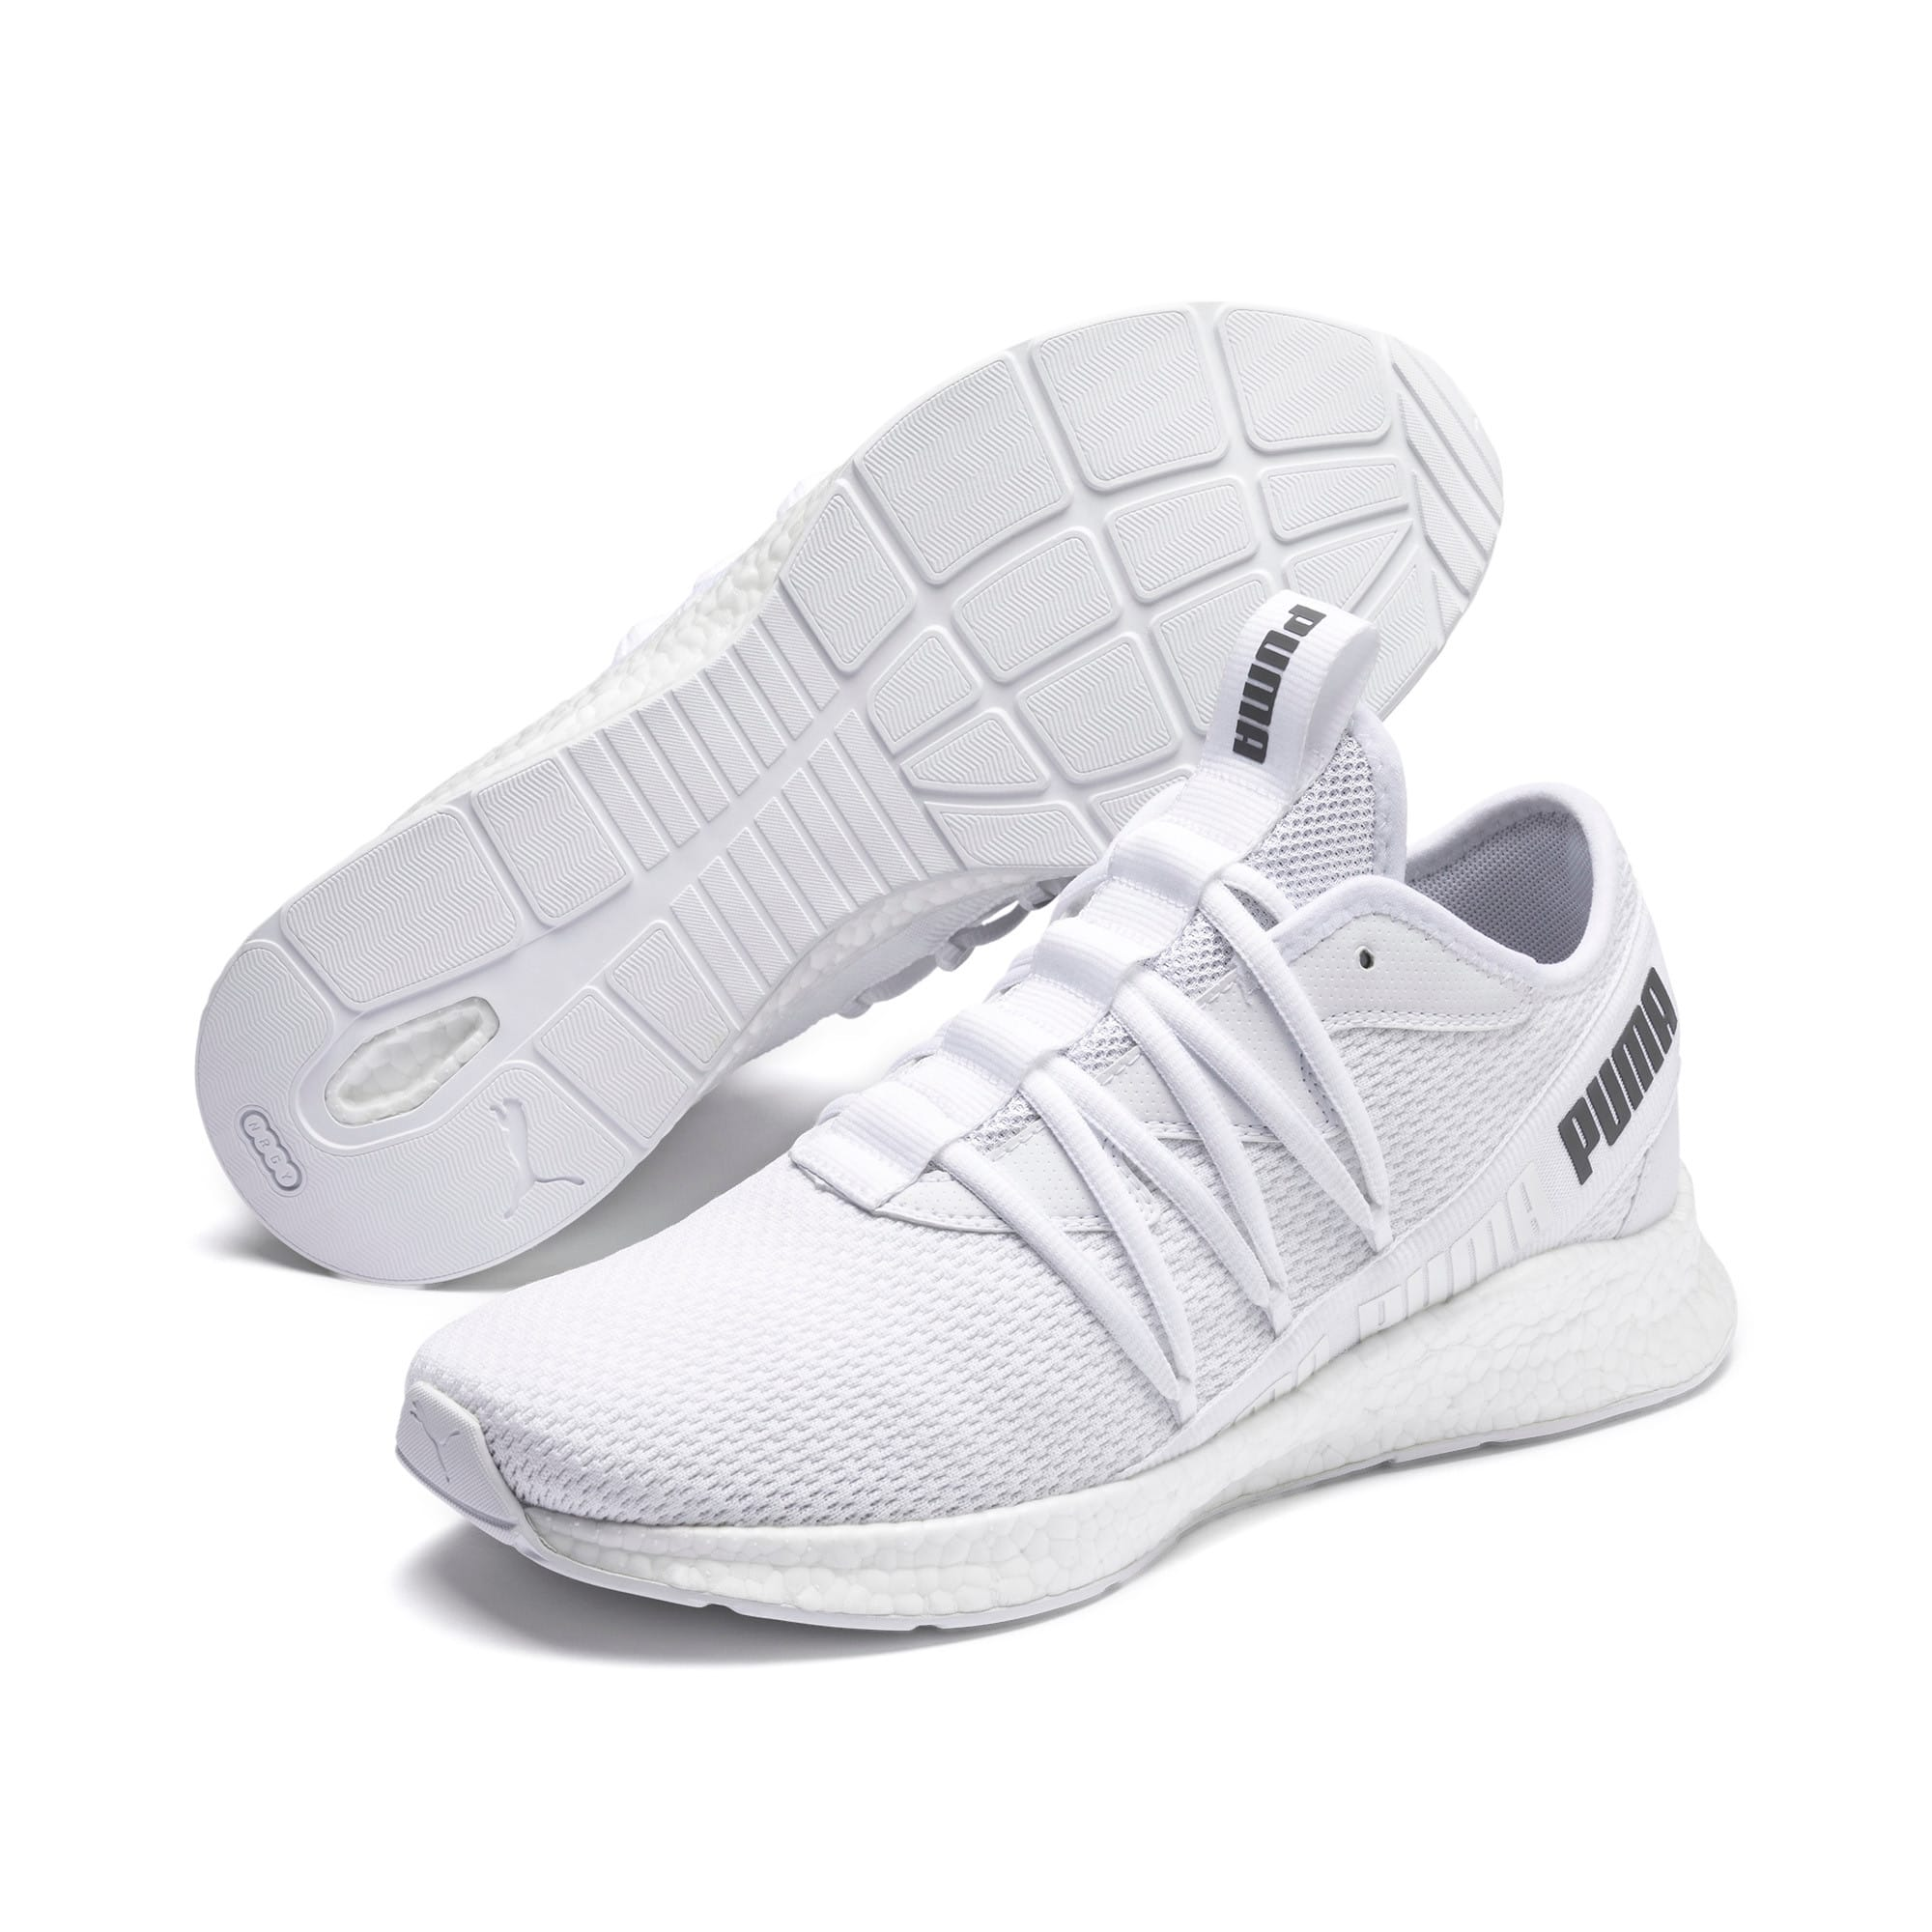 Thumbnail 2 of NRGY Star Running Shoes, Puma White-CASTLEROCK, medium